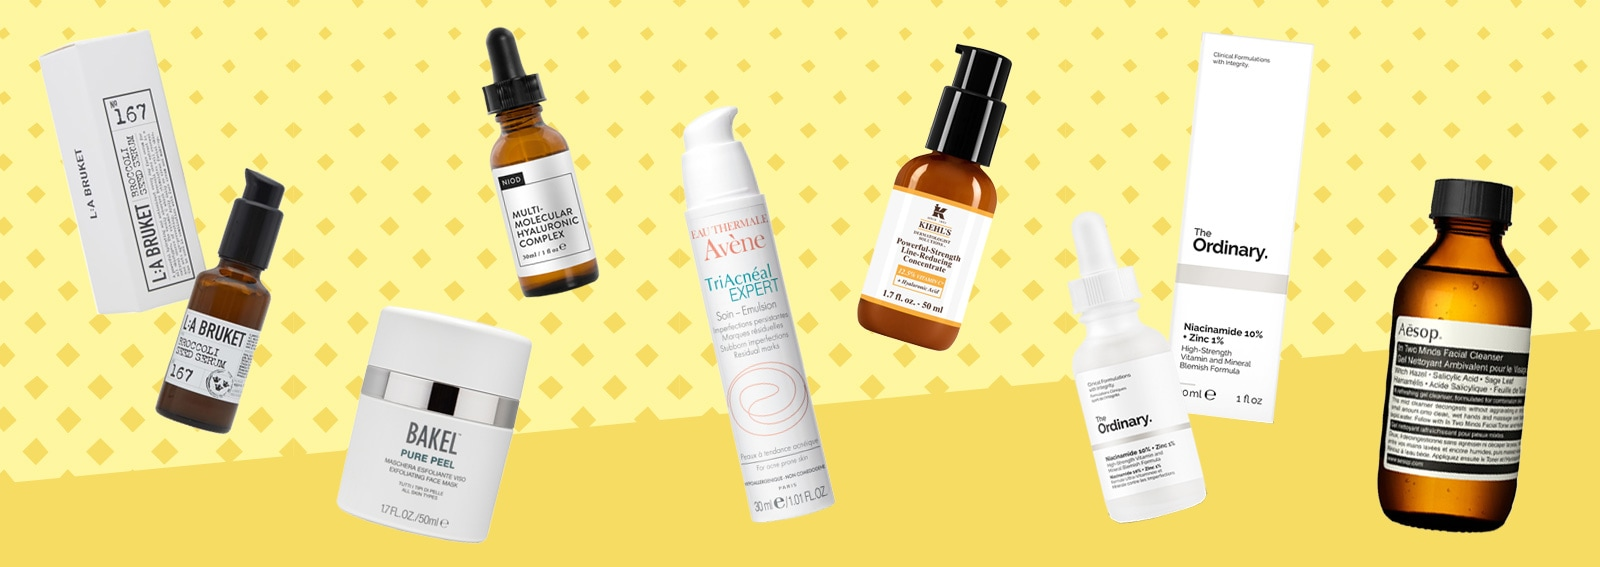 Pelle acneica: consigli e beauty routine per tenerla a bada